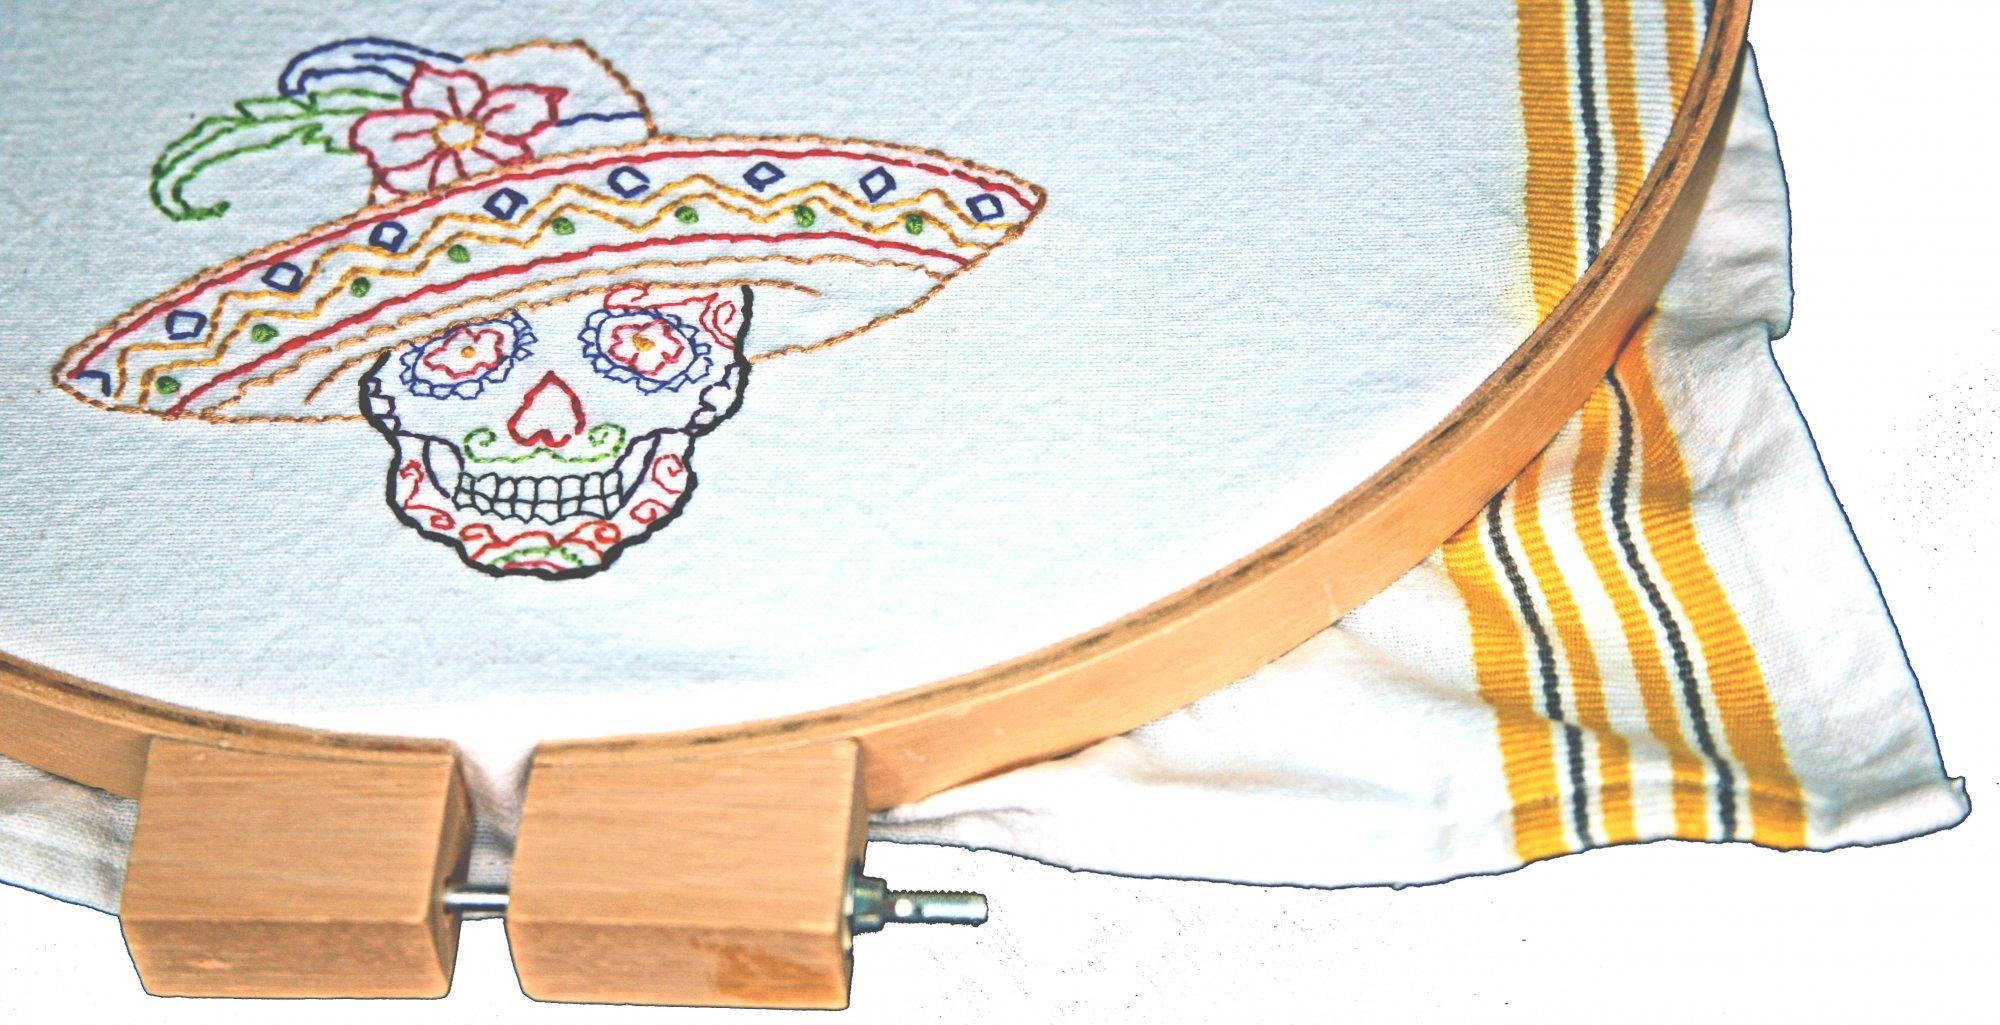 Senor Mustacho Embroidery Kit